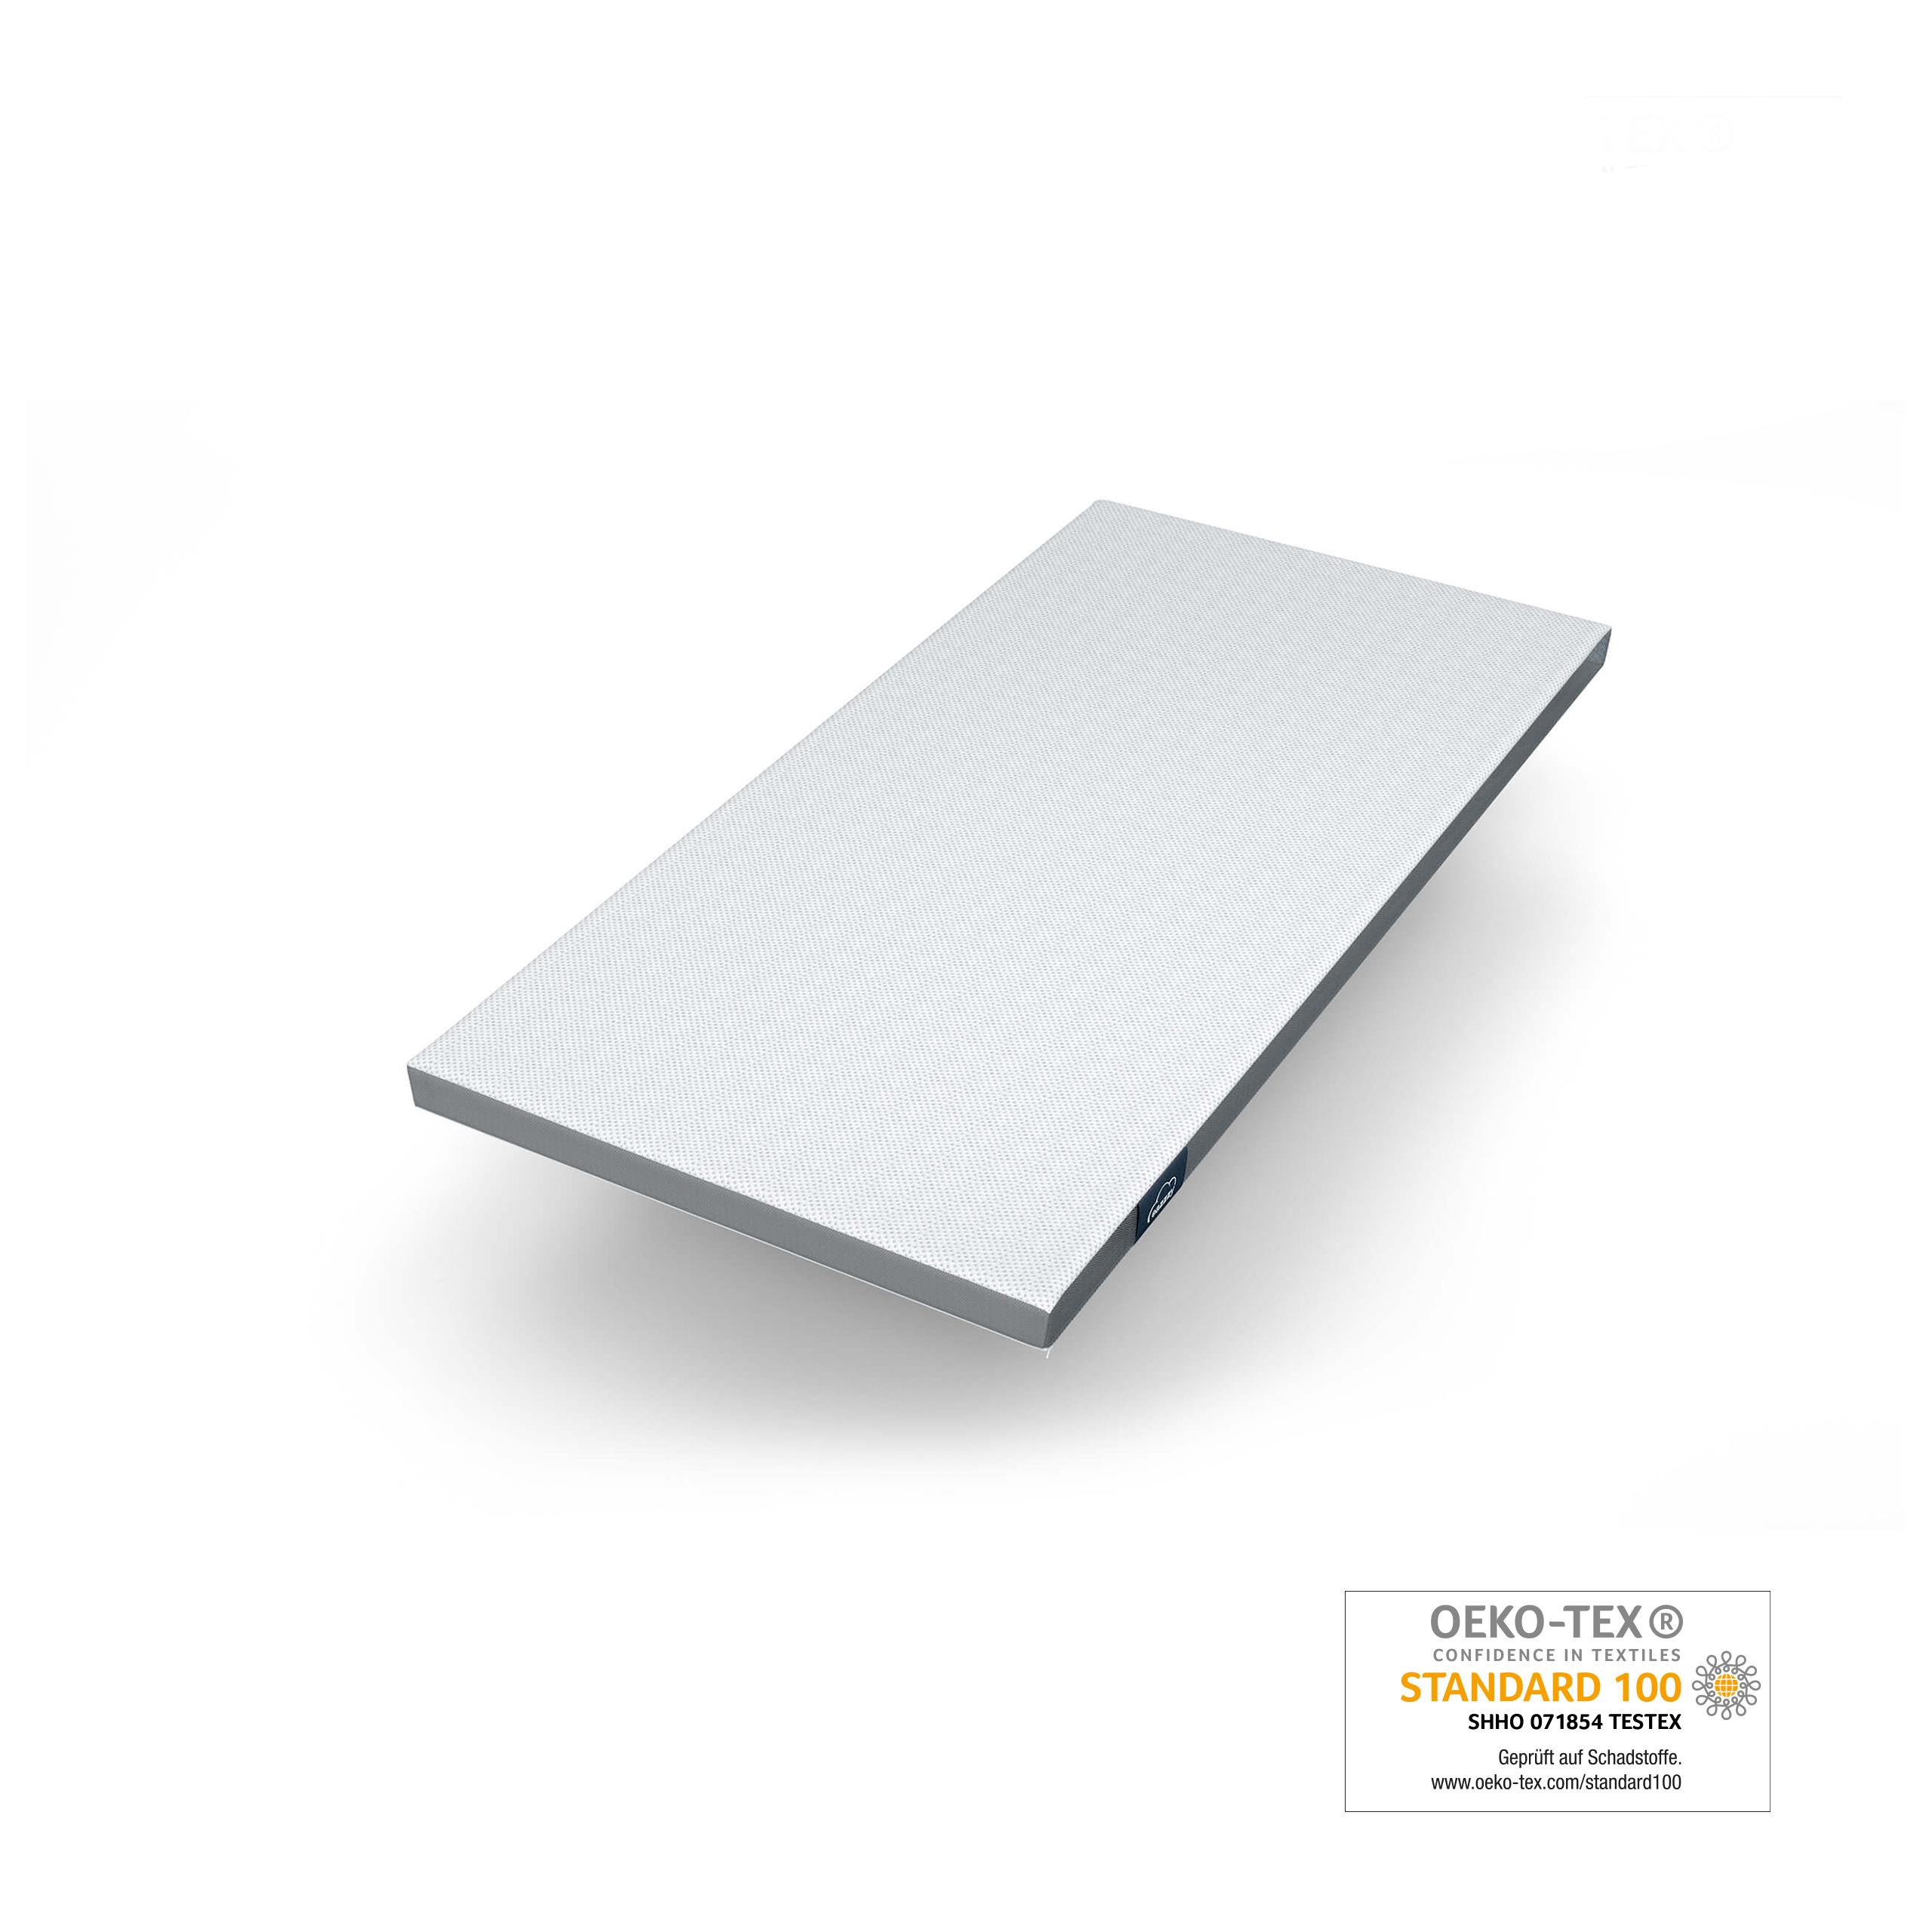 Genius eazzzy | Matratzentopper 100 x 200 x 7 cm A19244